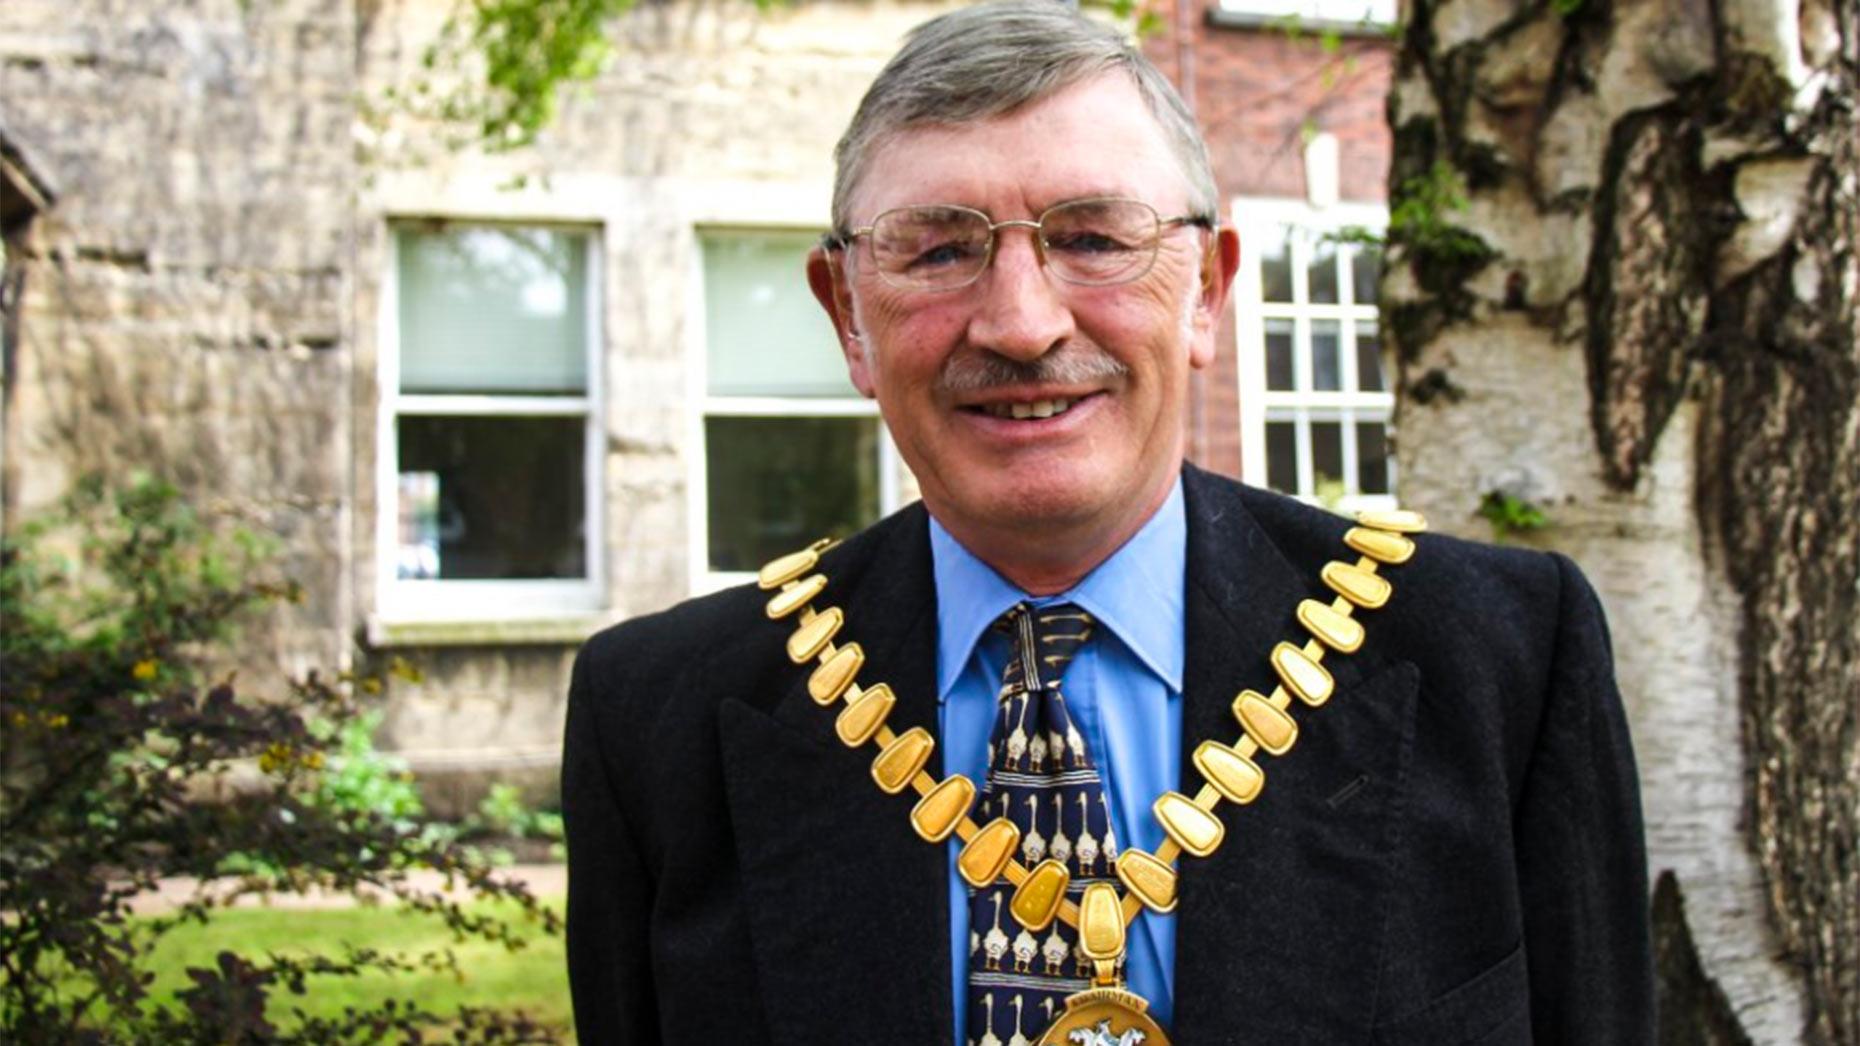 New chairman, Councillor Thomas Martin Trollope-Bellew. Photo: Lincolnshire County Council